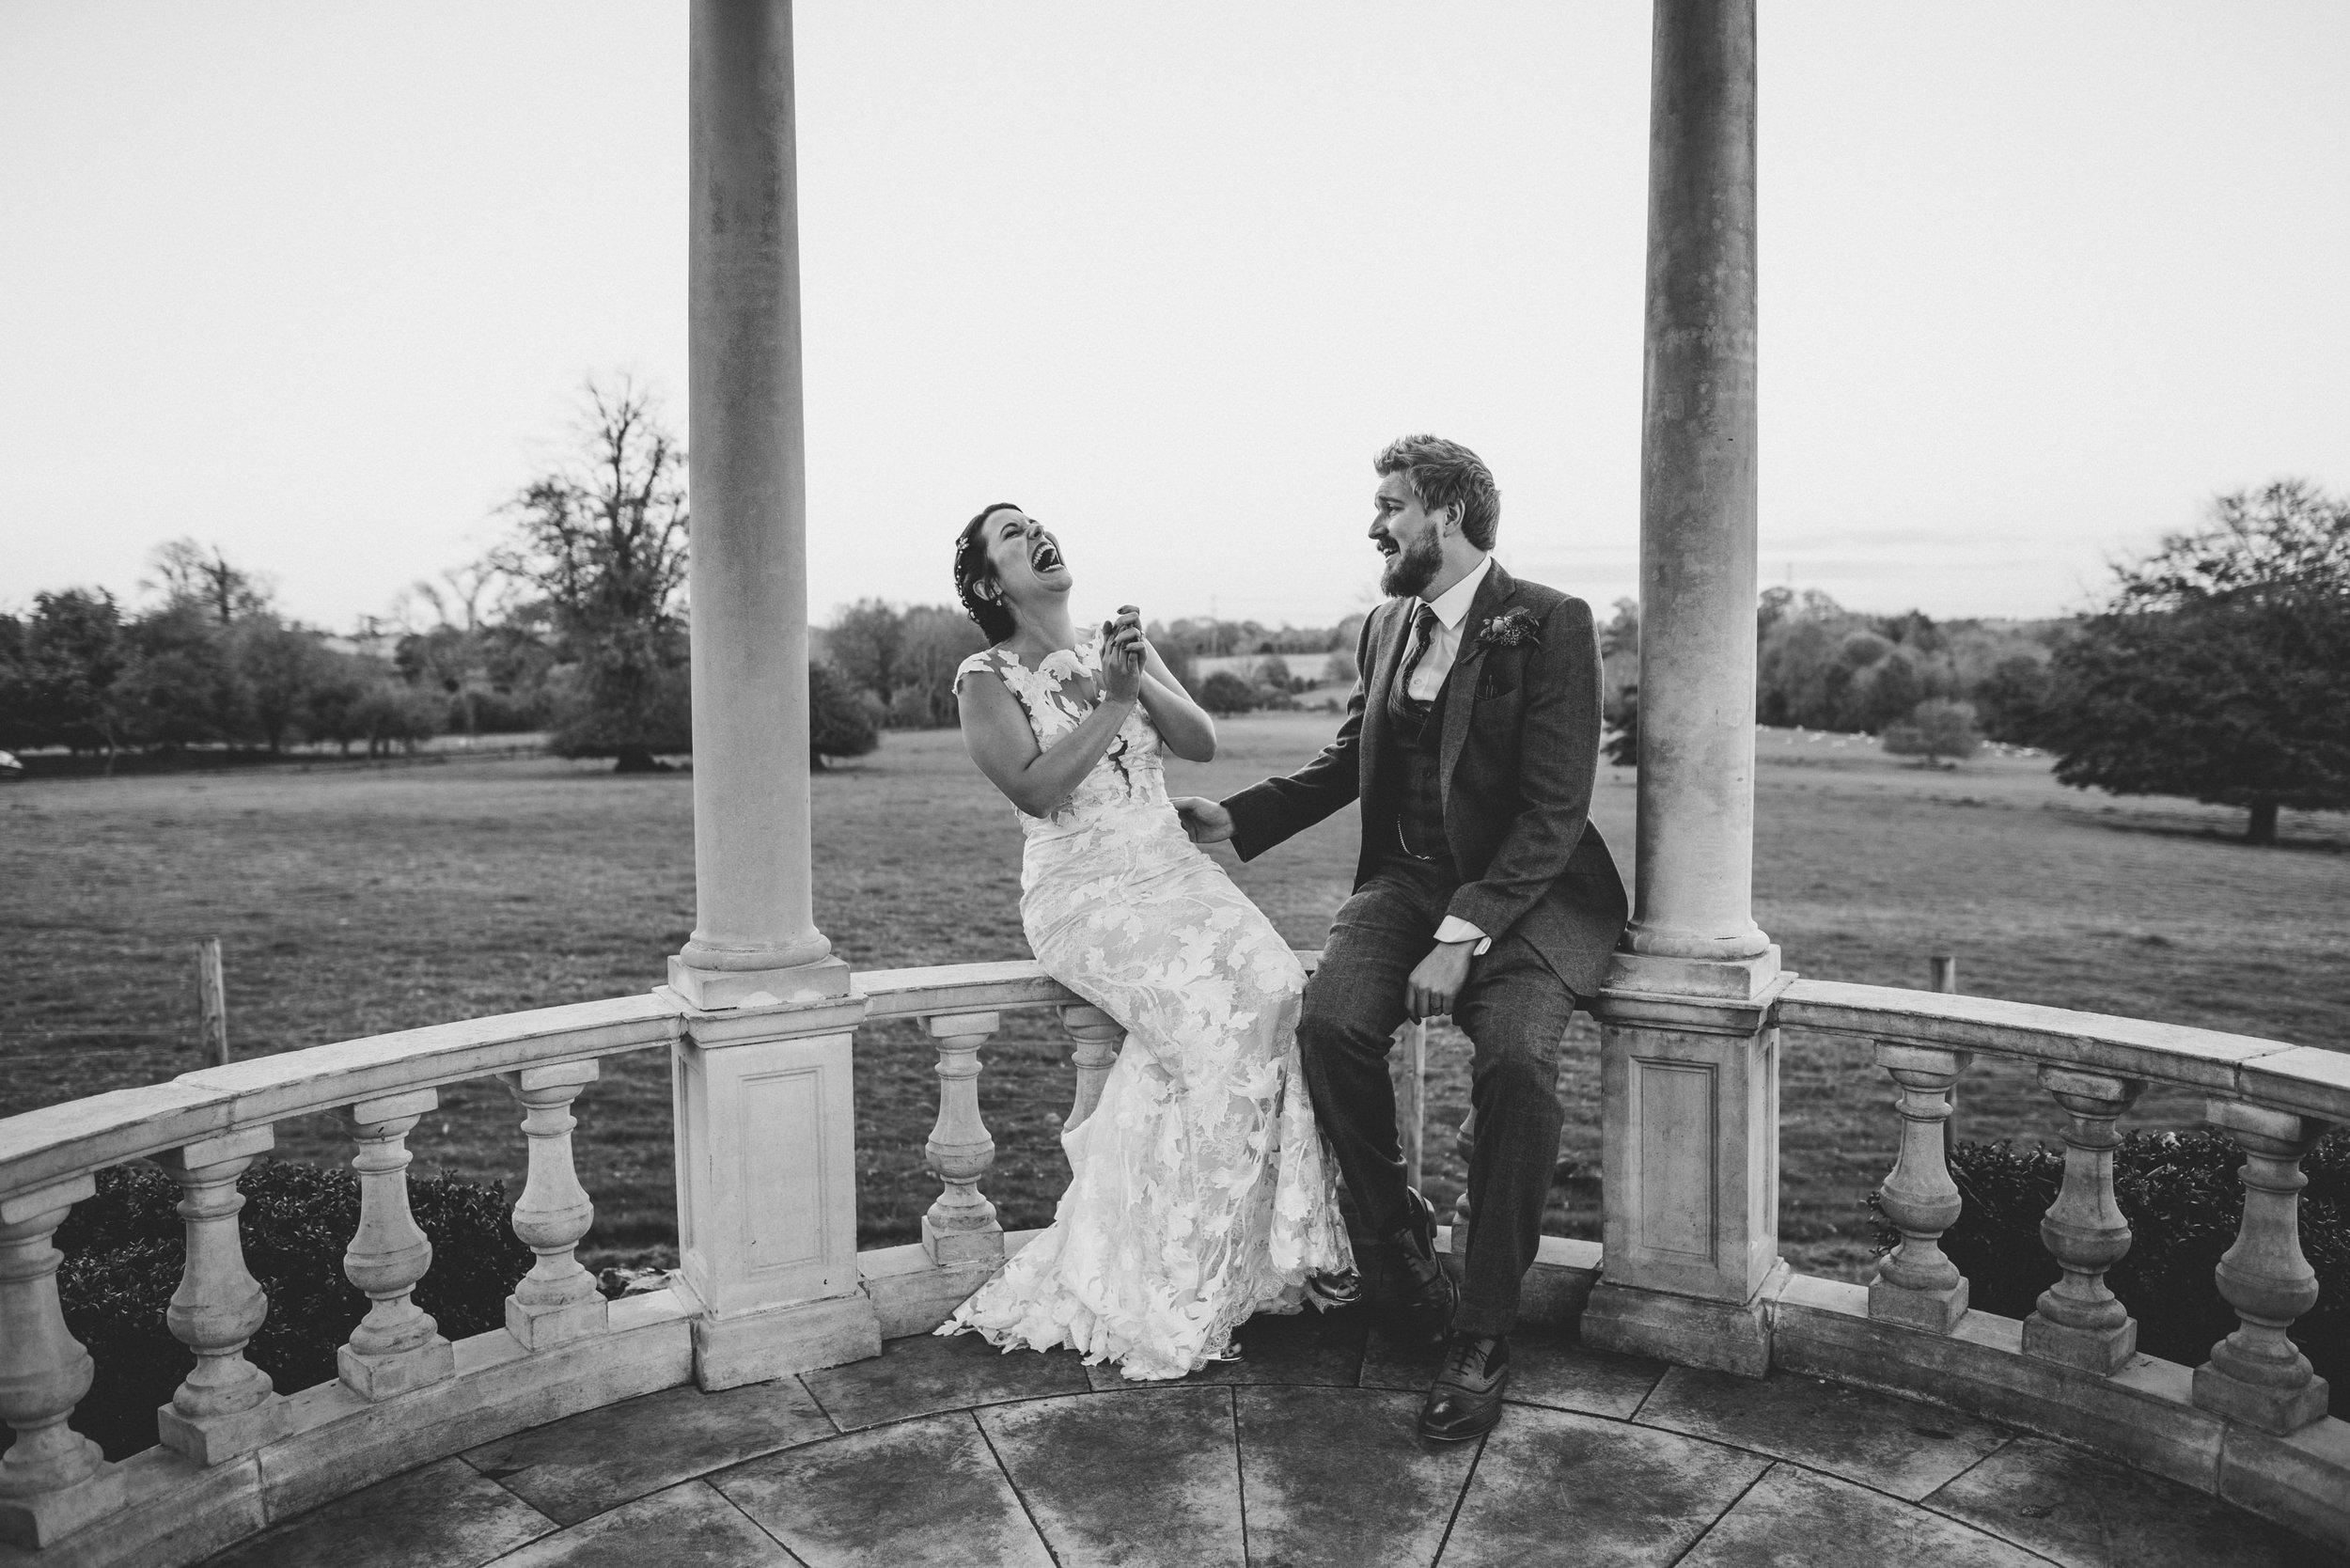 0143-LISA-DEVINE-PHOTOGRAPHY-ALTERNATIVE-WEDDING-PHOTOGRAPHY-SCOTLAND-DESTINATION-WEDDINGS-GLASGOW-WEDDINGS-COOL-WEDDINGS-STYLISH-WEDDINGS.JPG